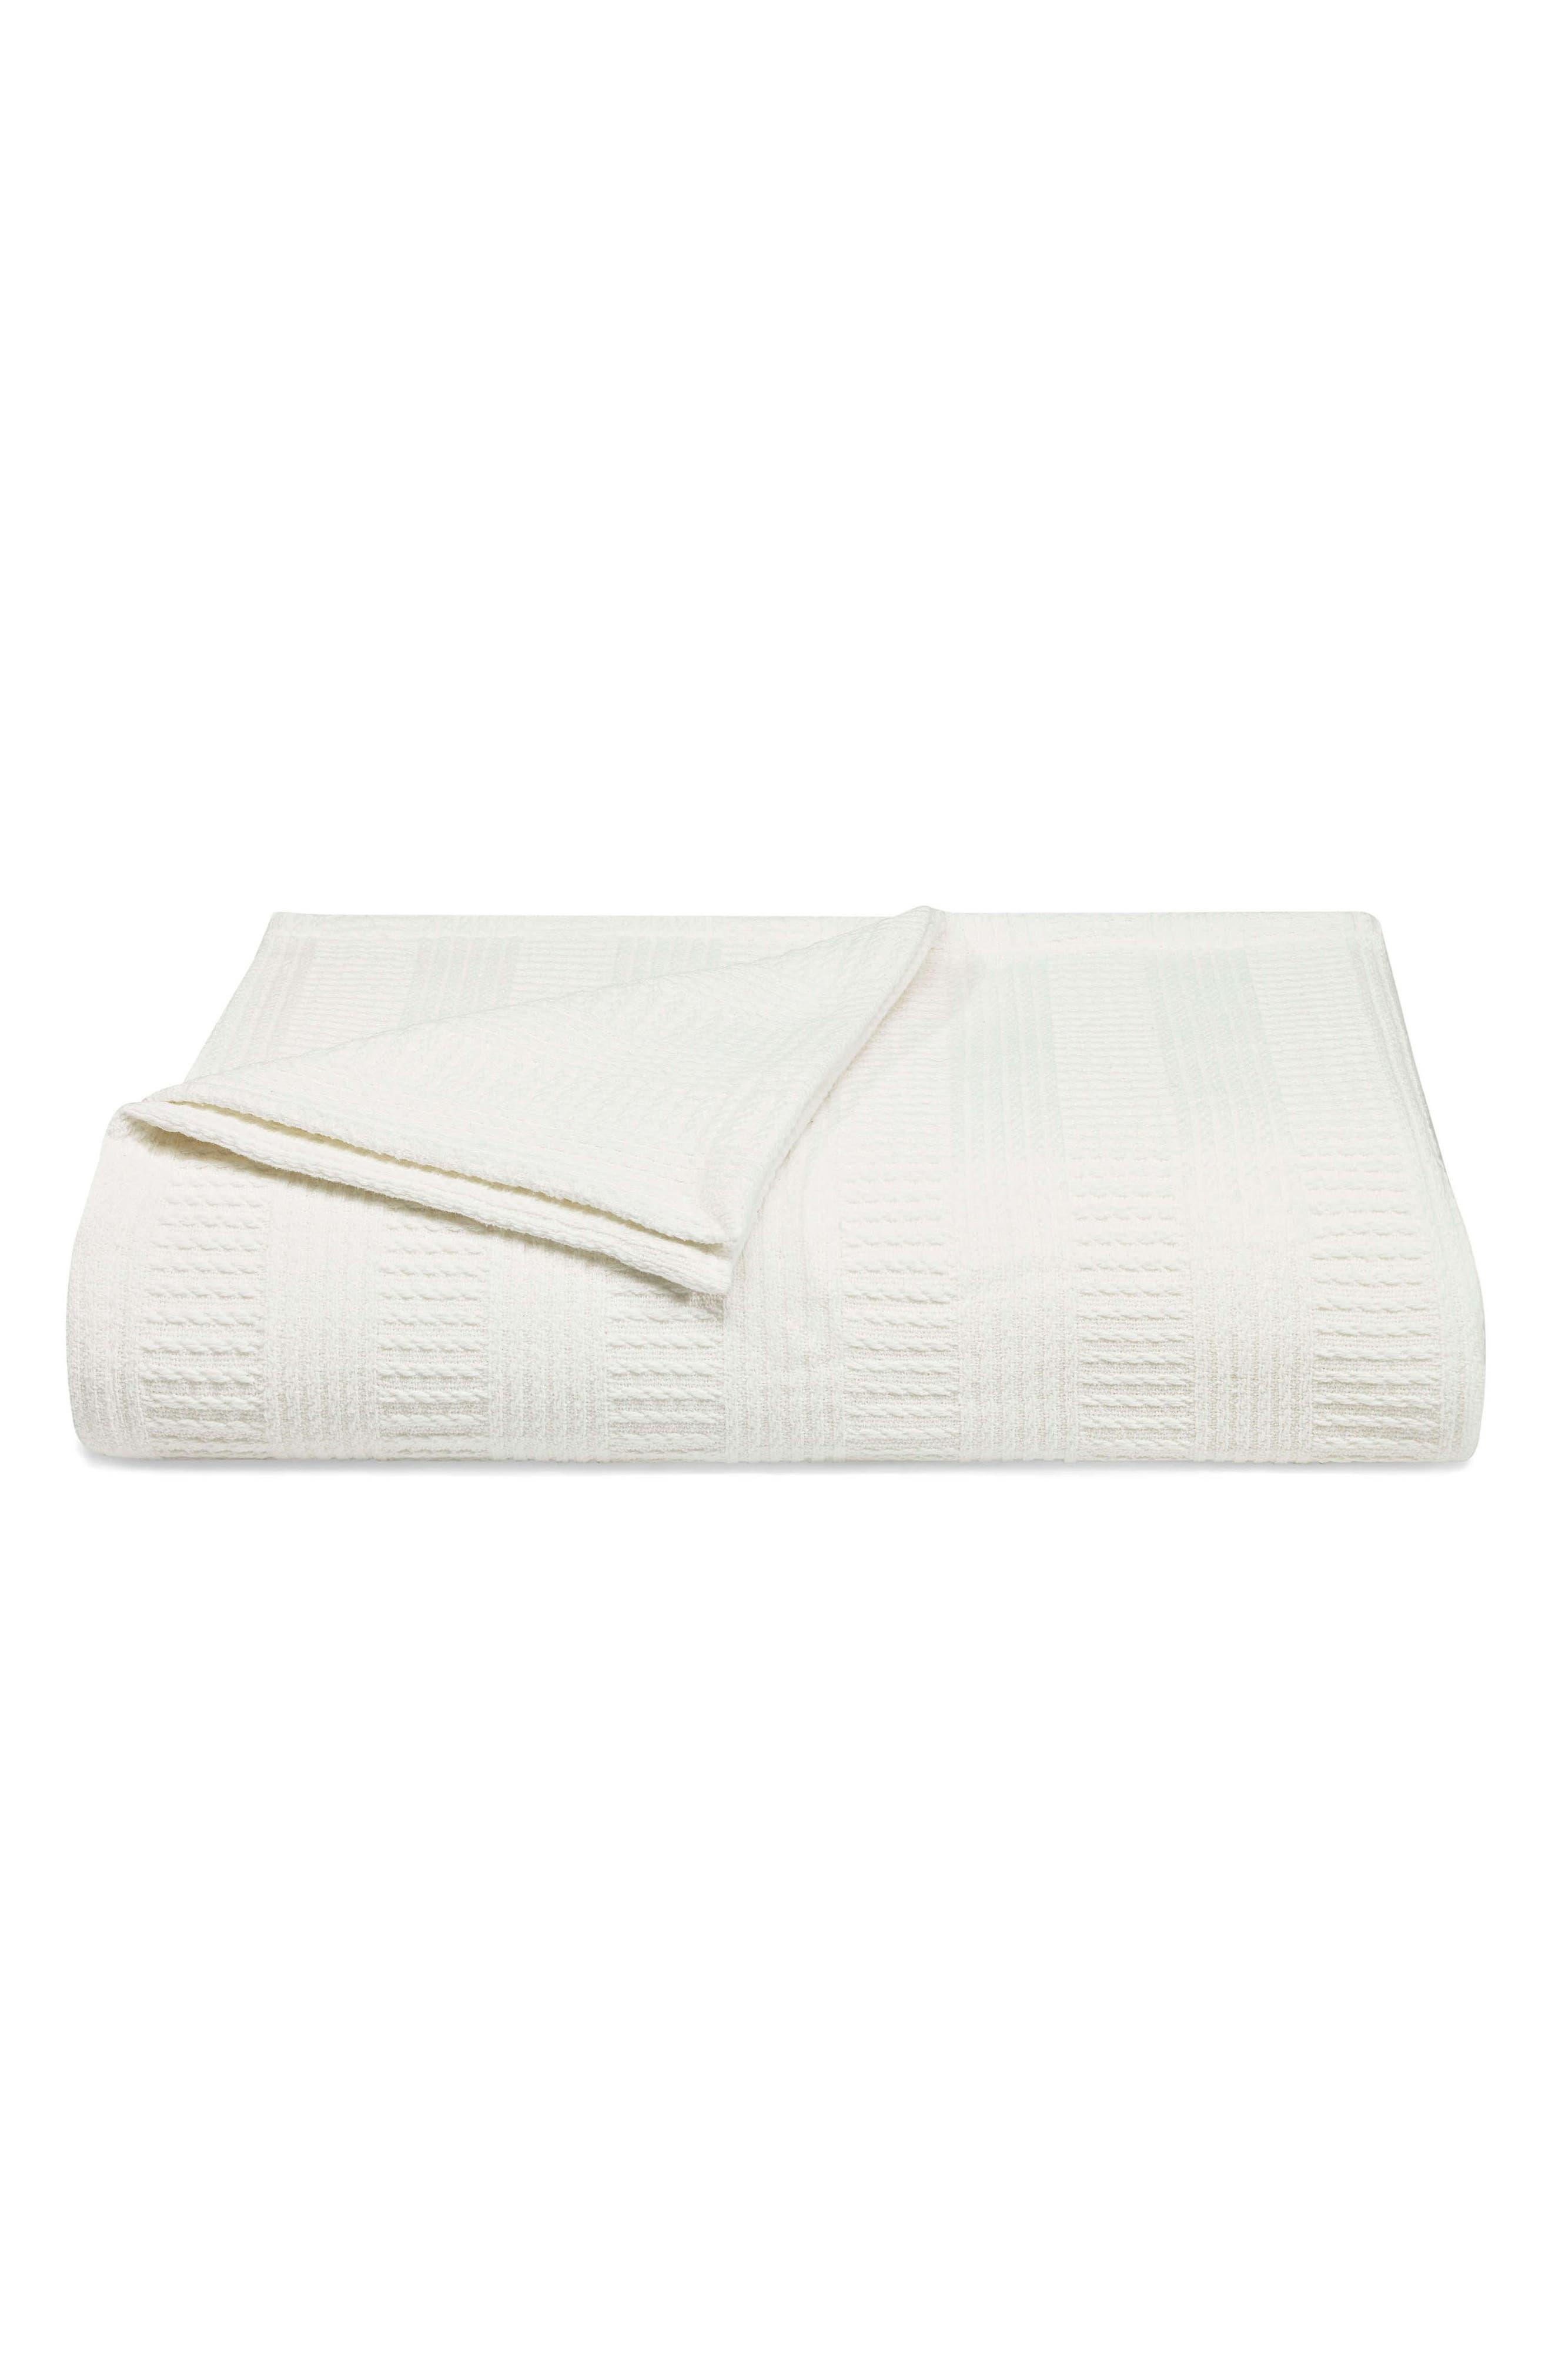 Rope Stripe Blanket,                         Main,                         color, 100